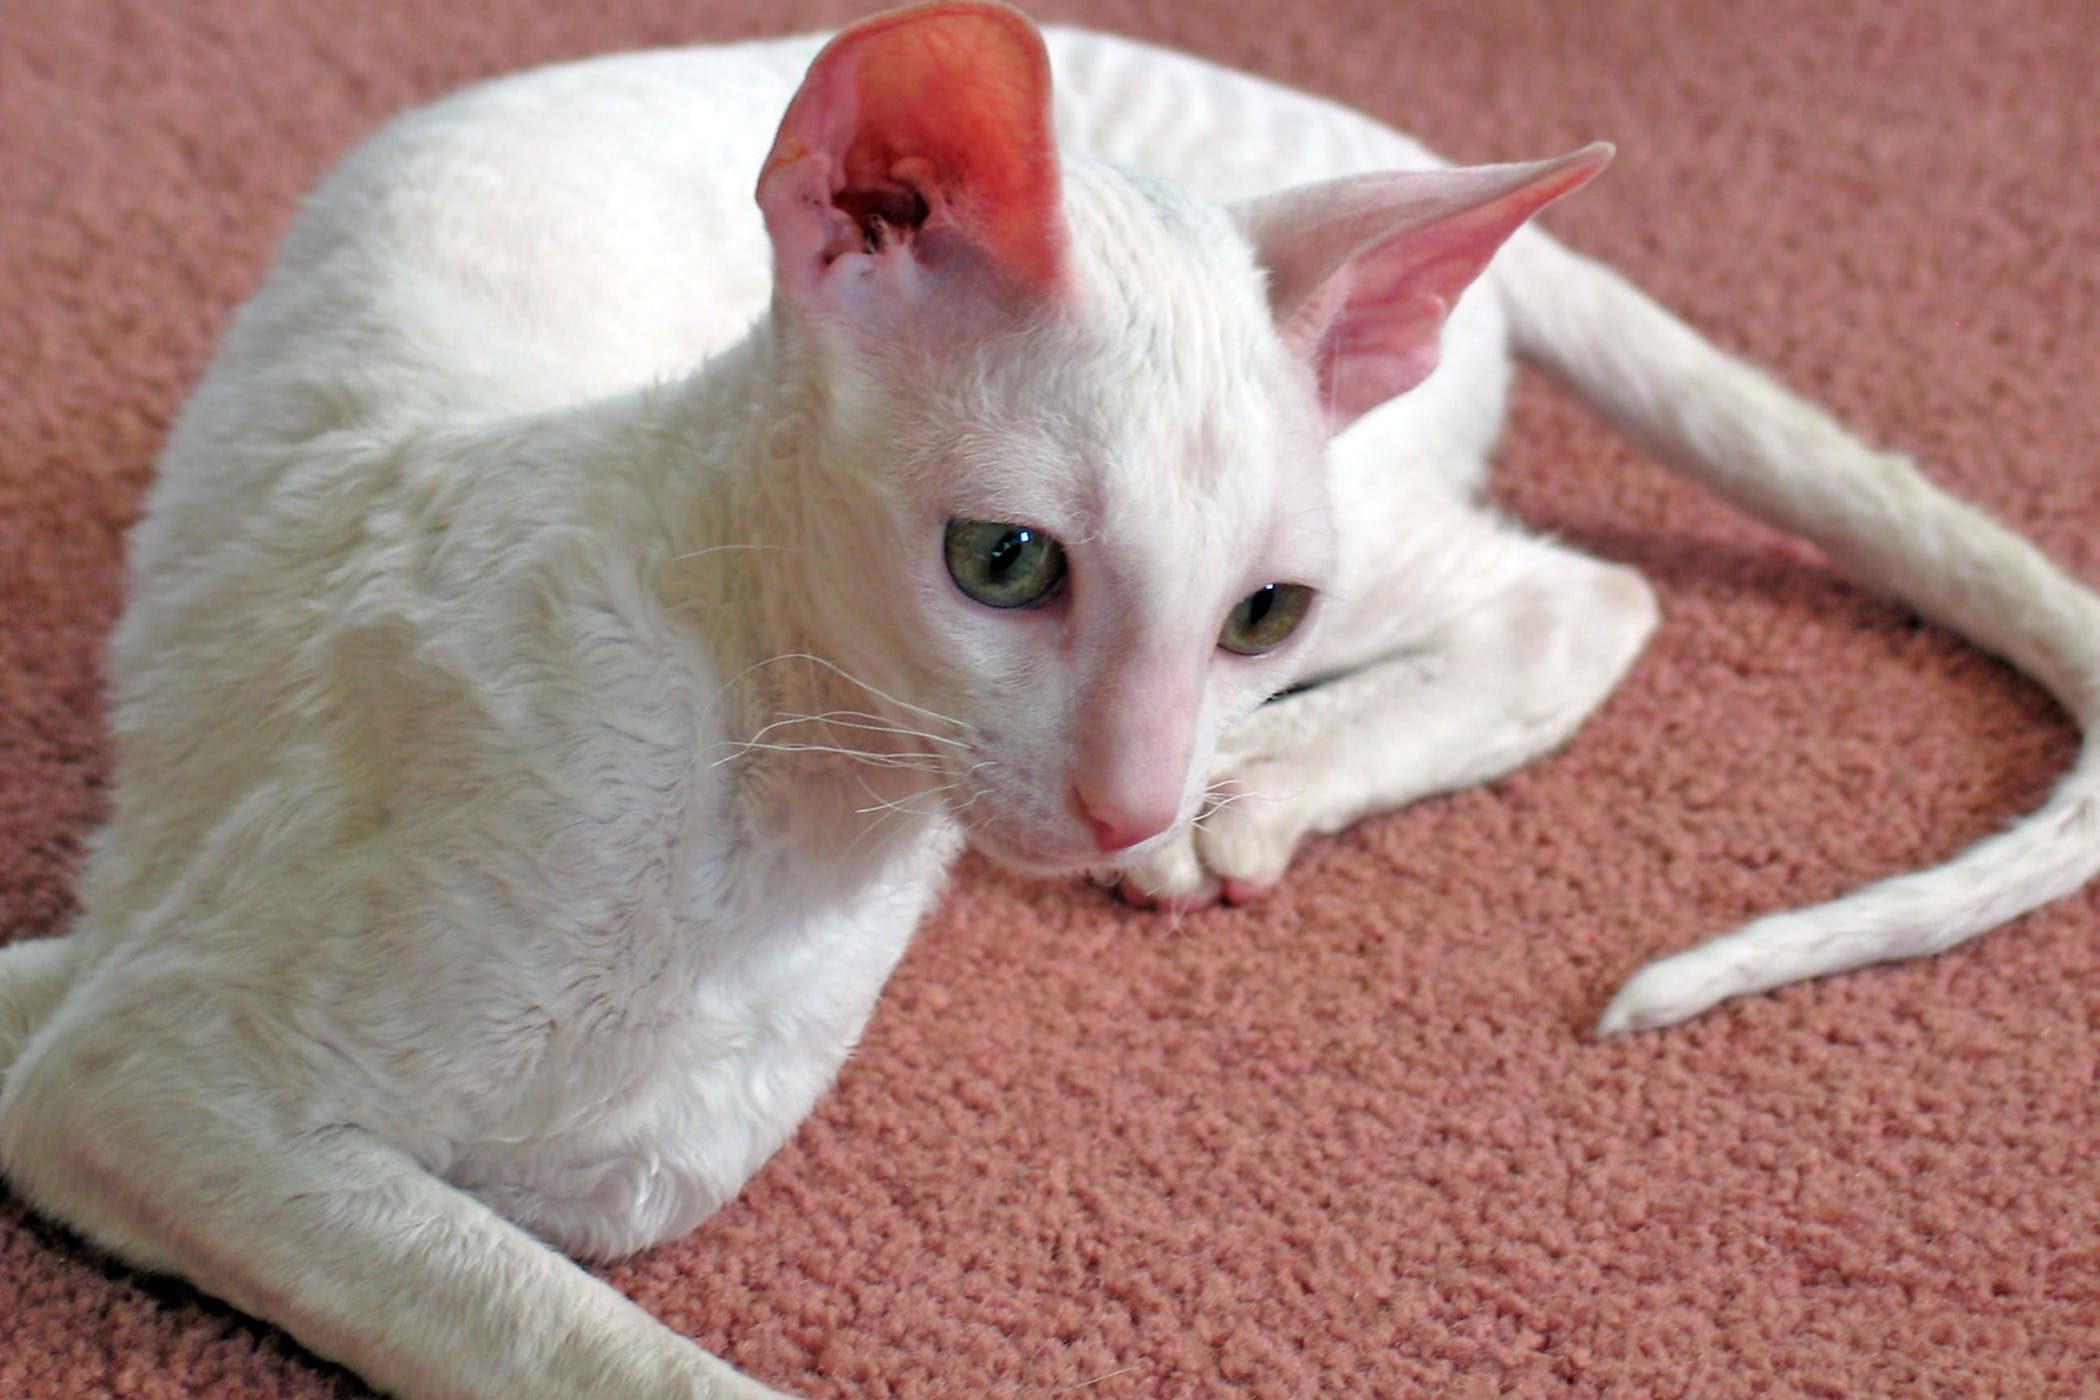 Preputial Discharge in Cats